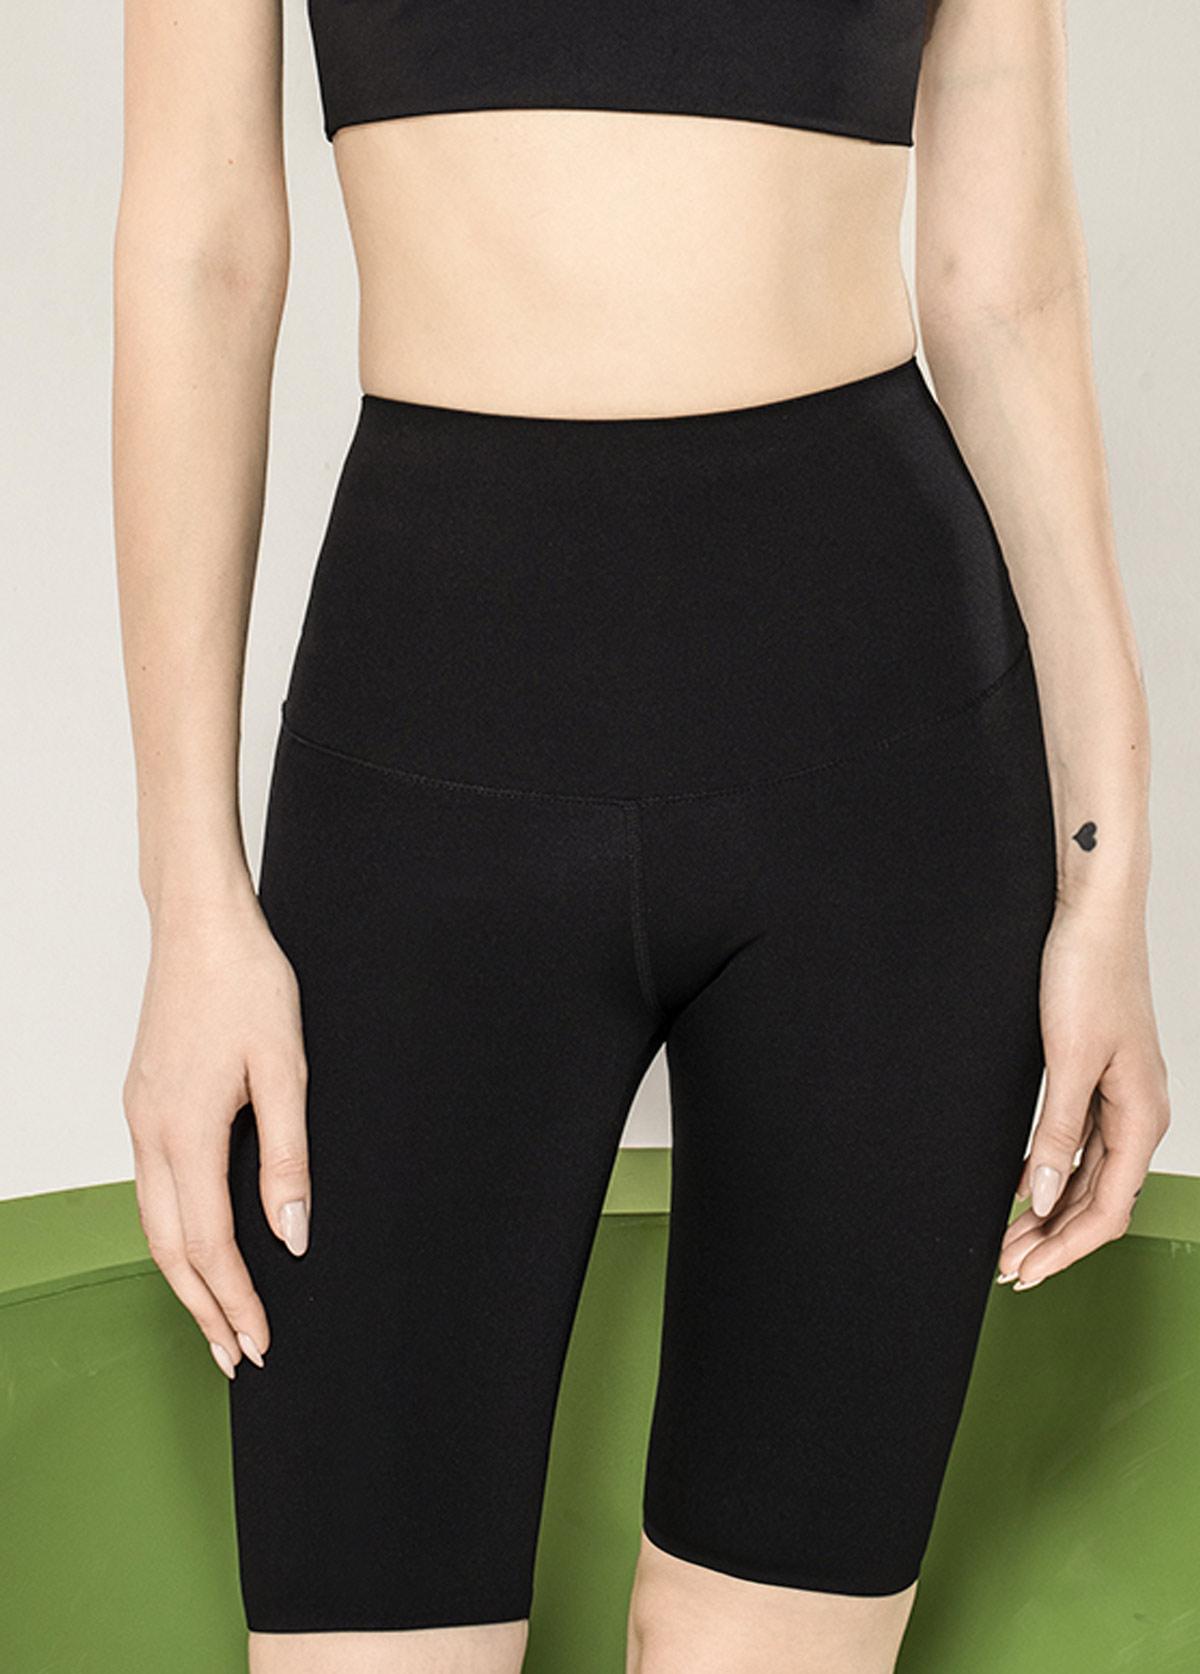 Skinny High Waist Black Knee Length Pants